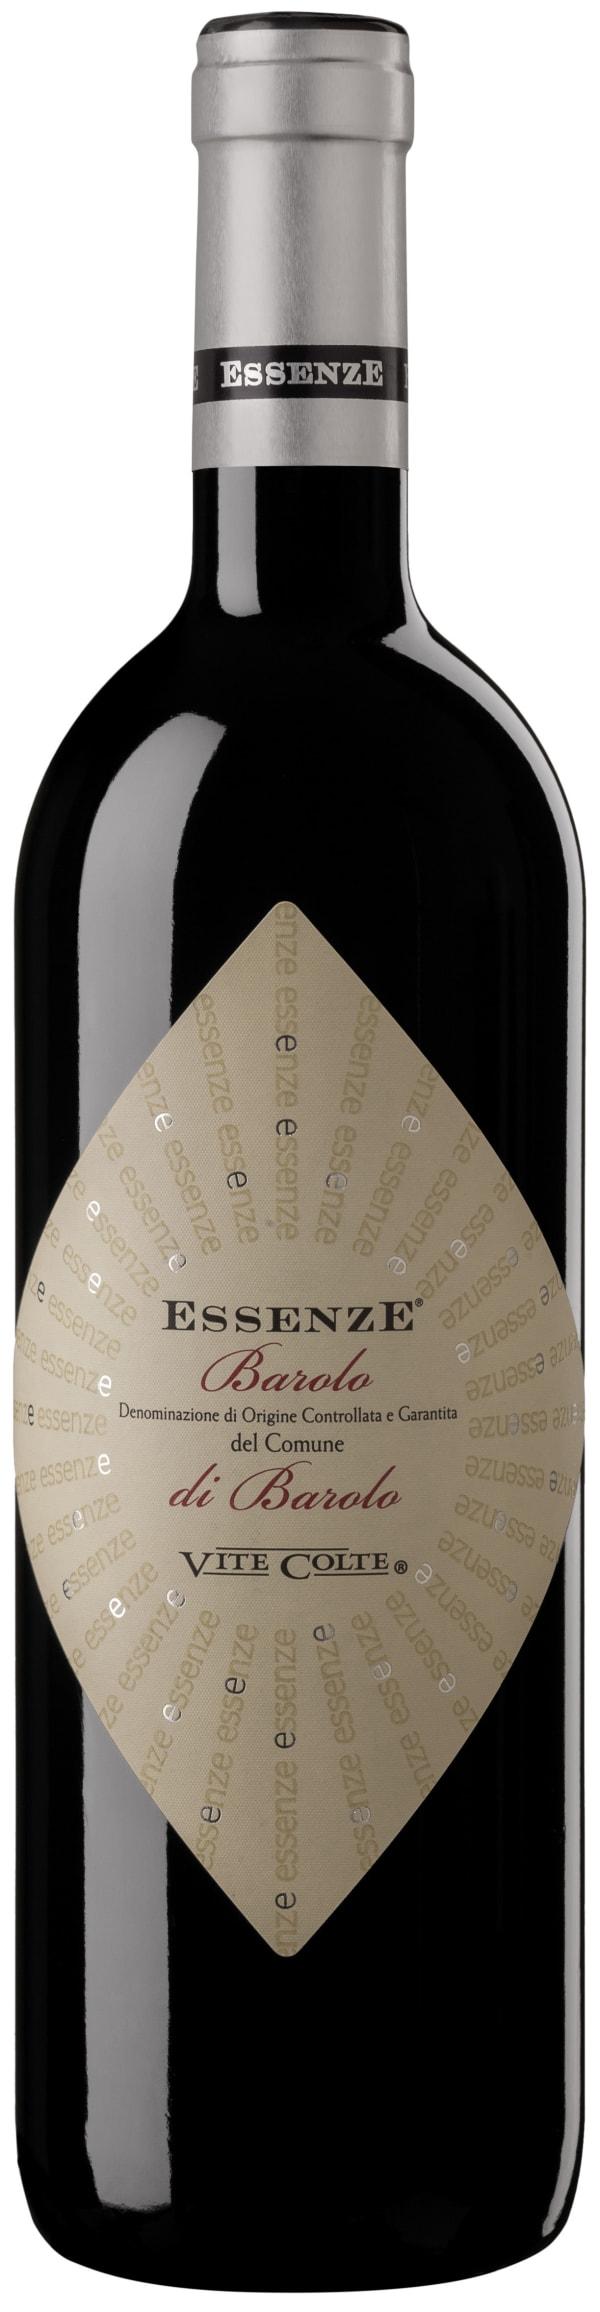 Barolo Essenze 2011